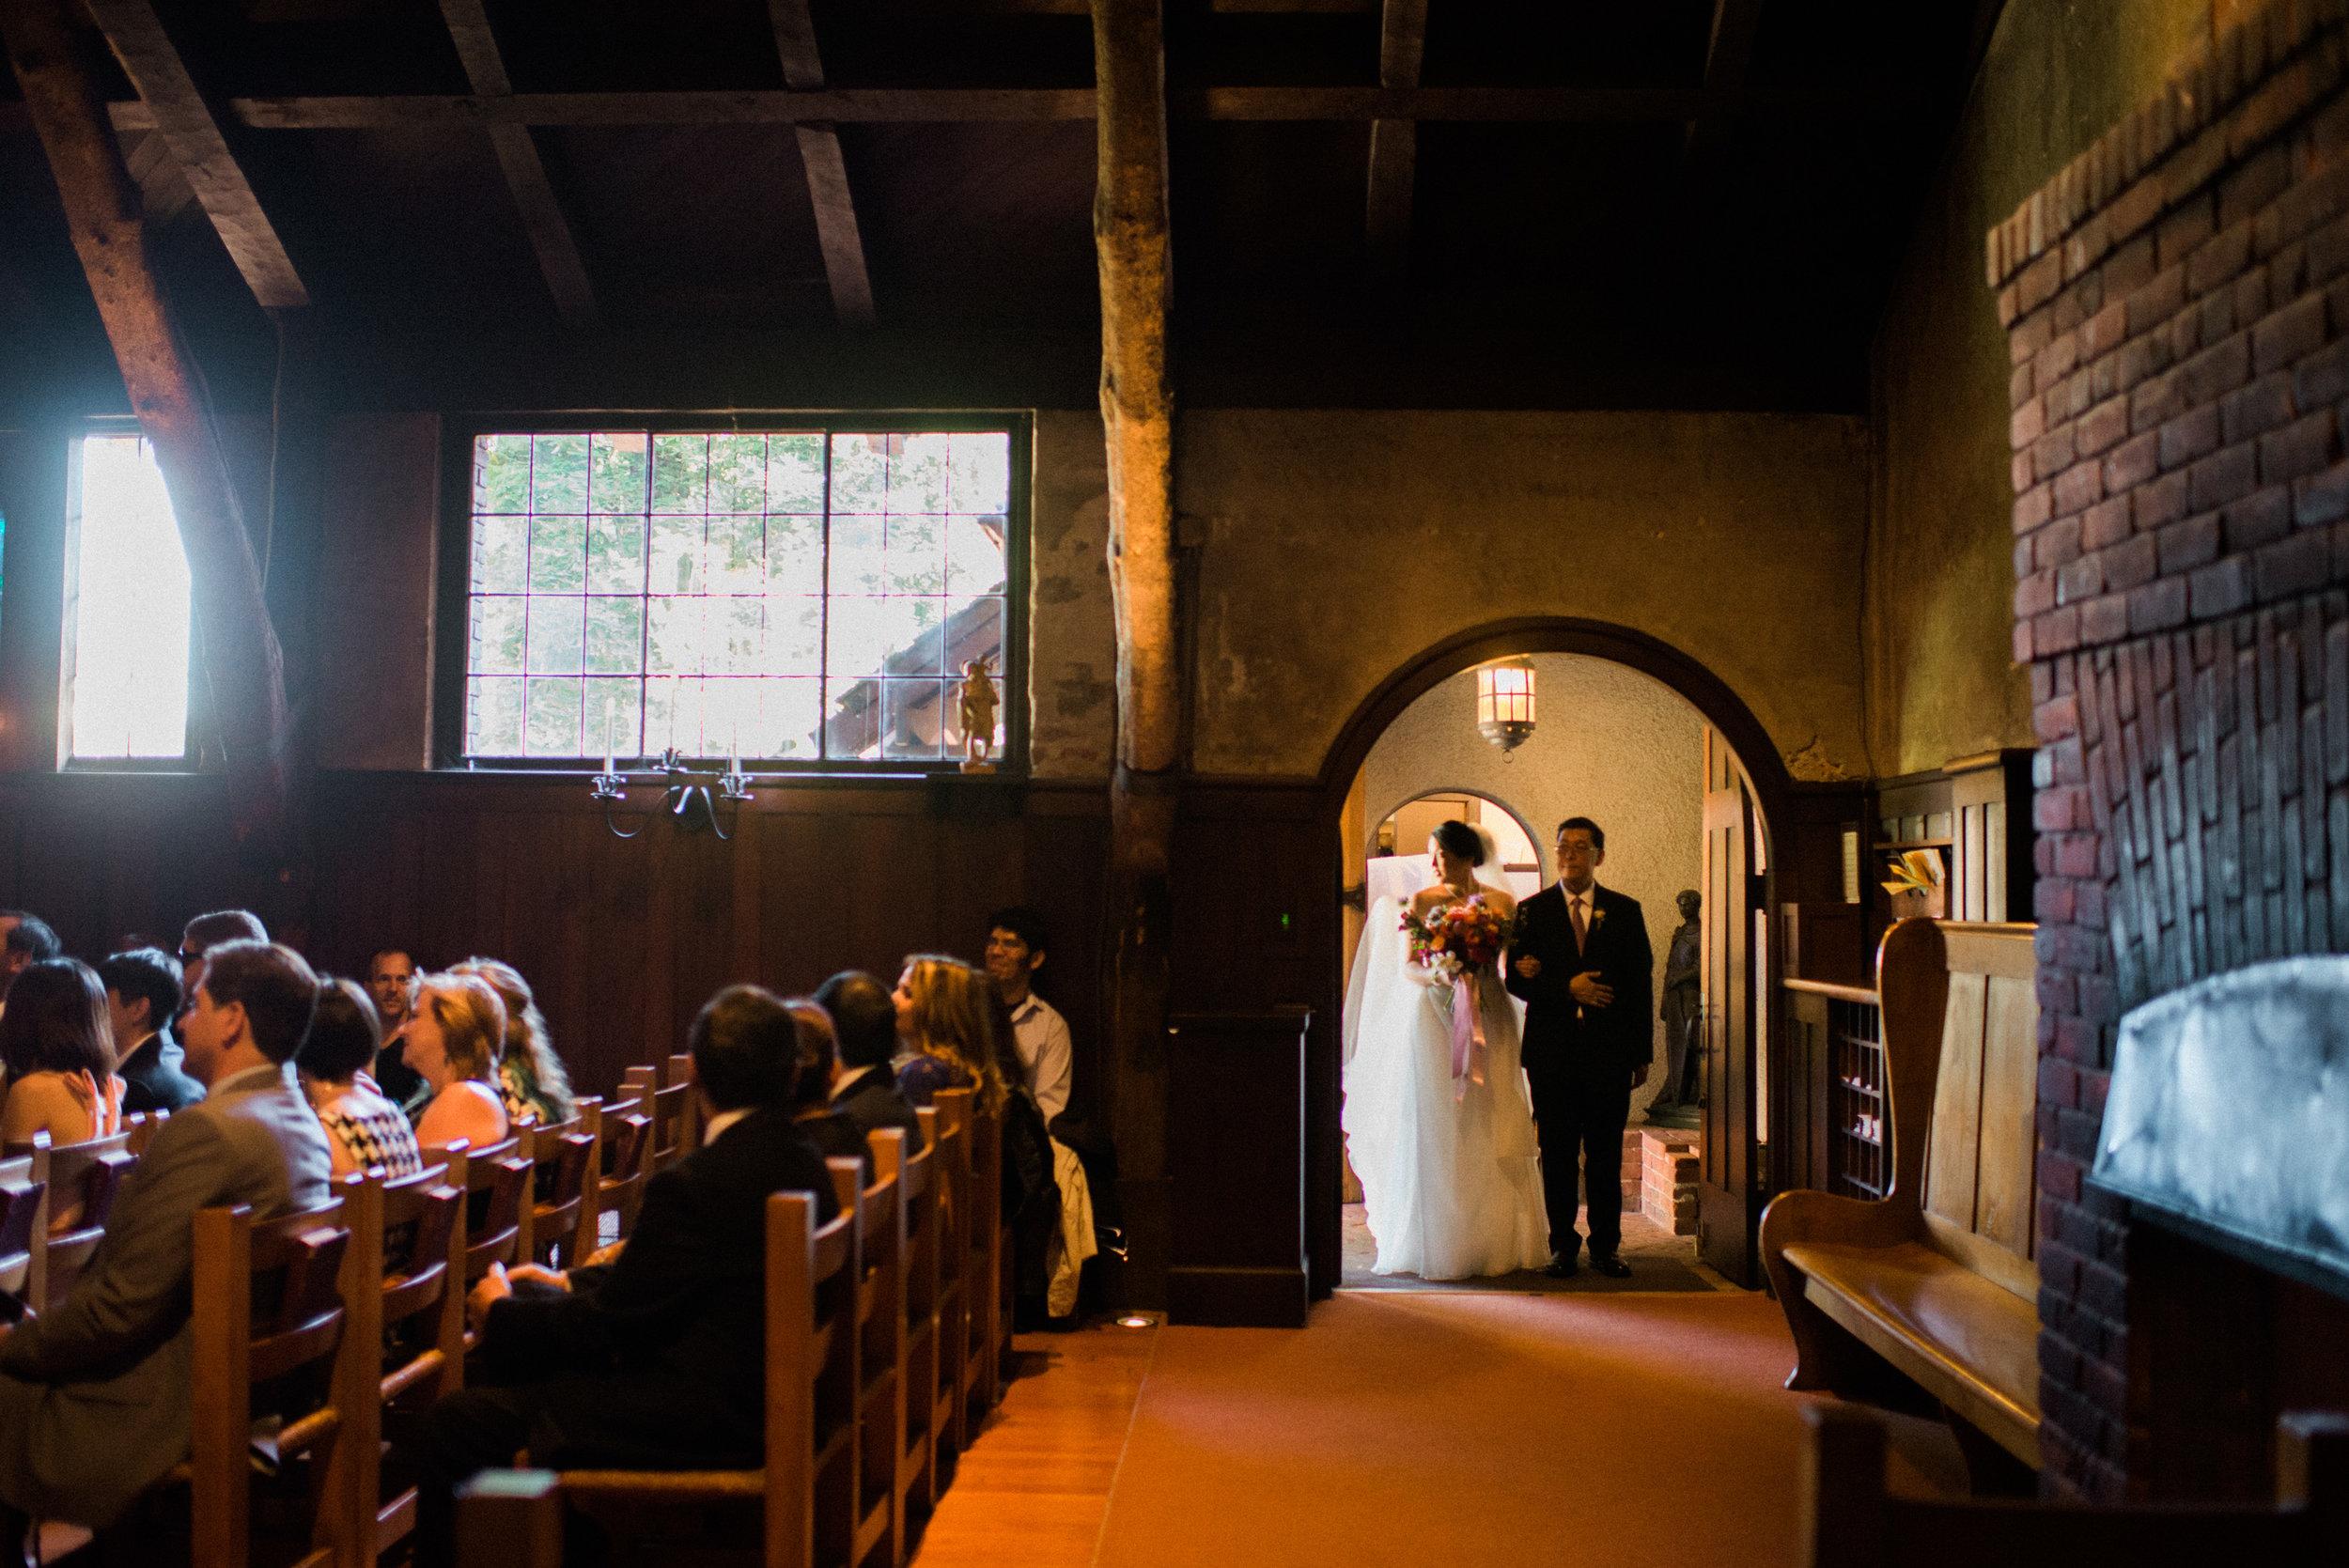 Swedenborgian Church Dogpatch Winery Wedding024.jpg